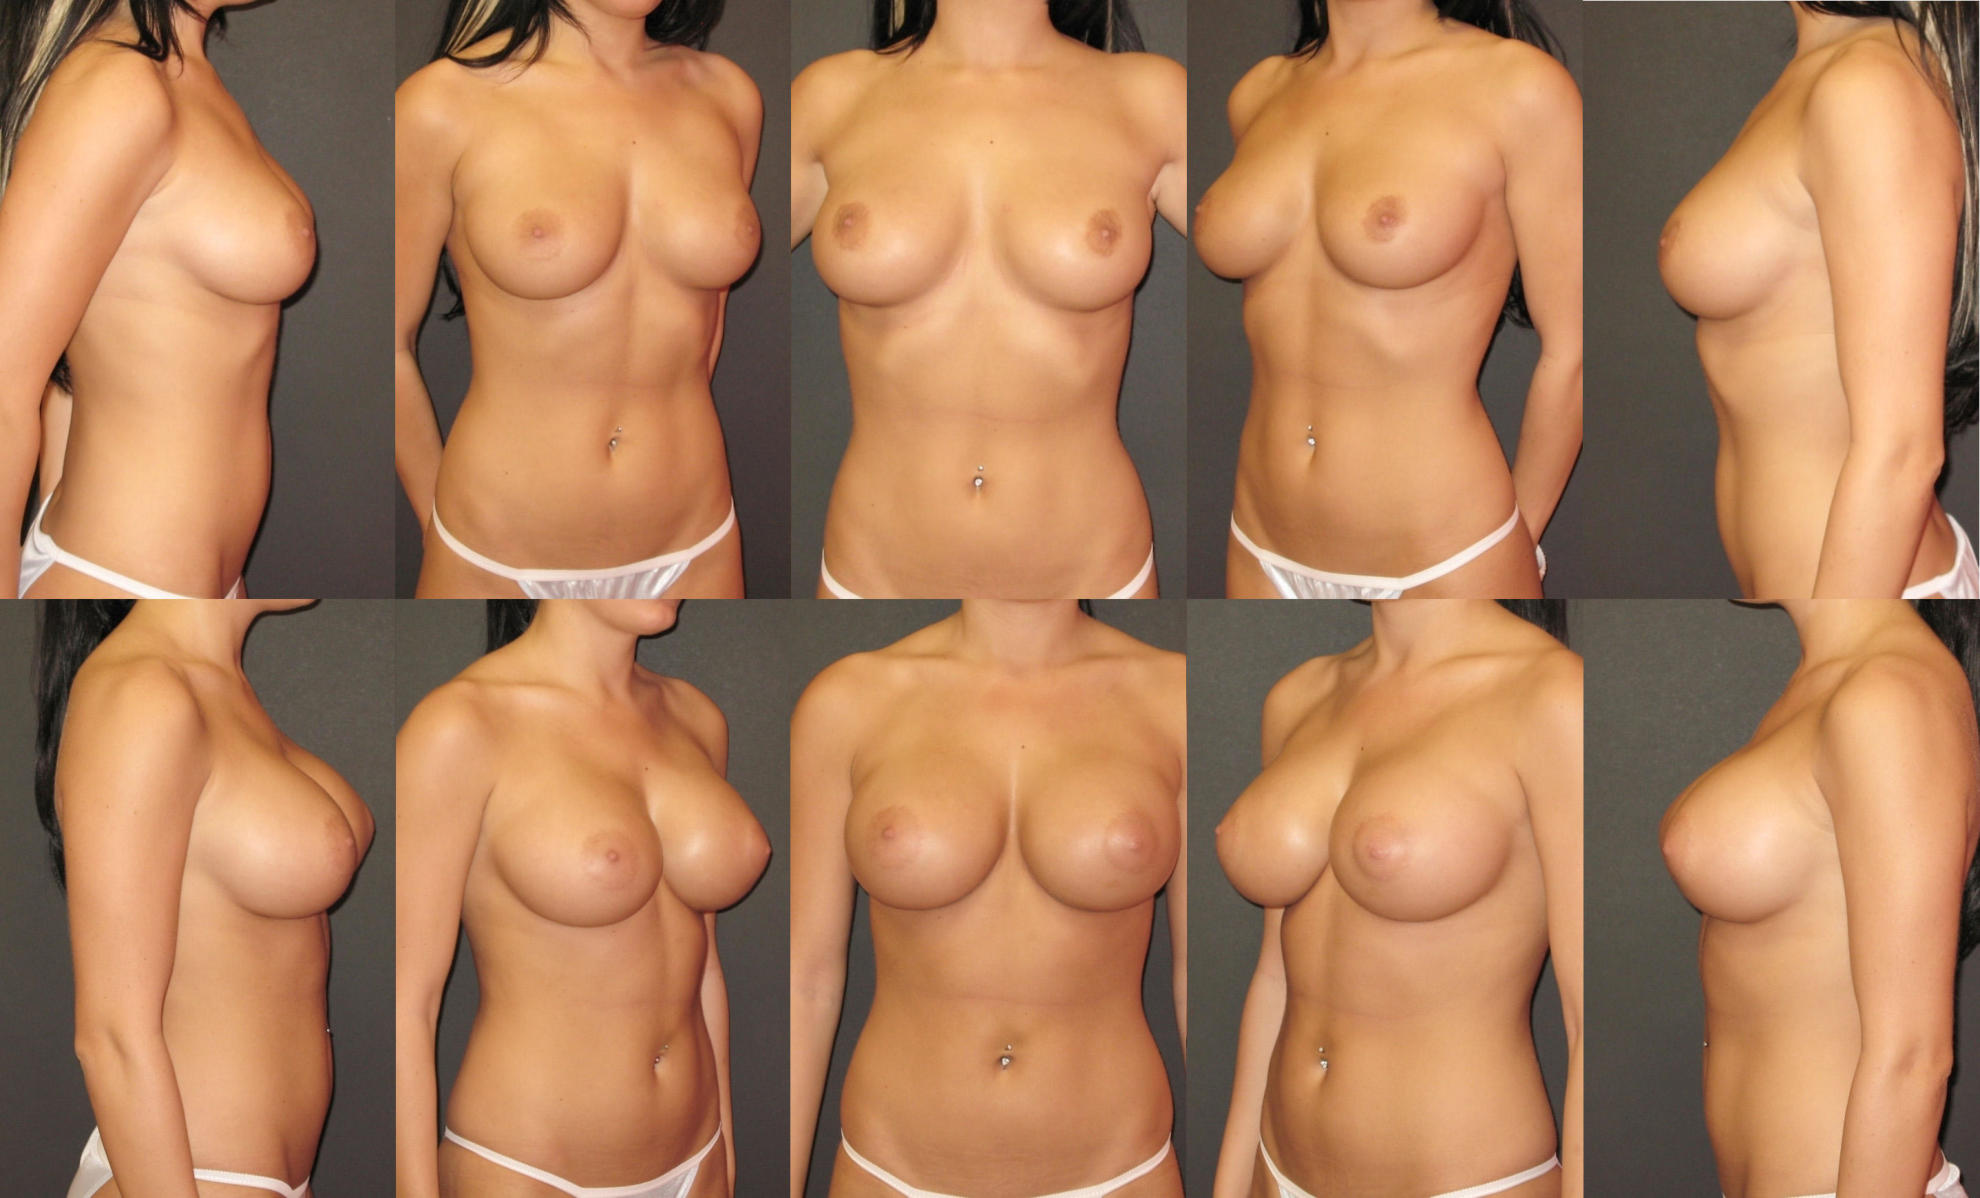 Разная голая женская грудь